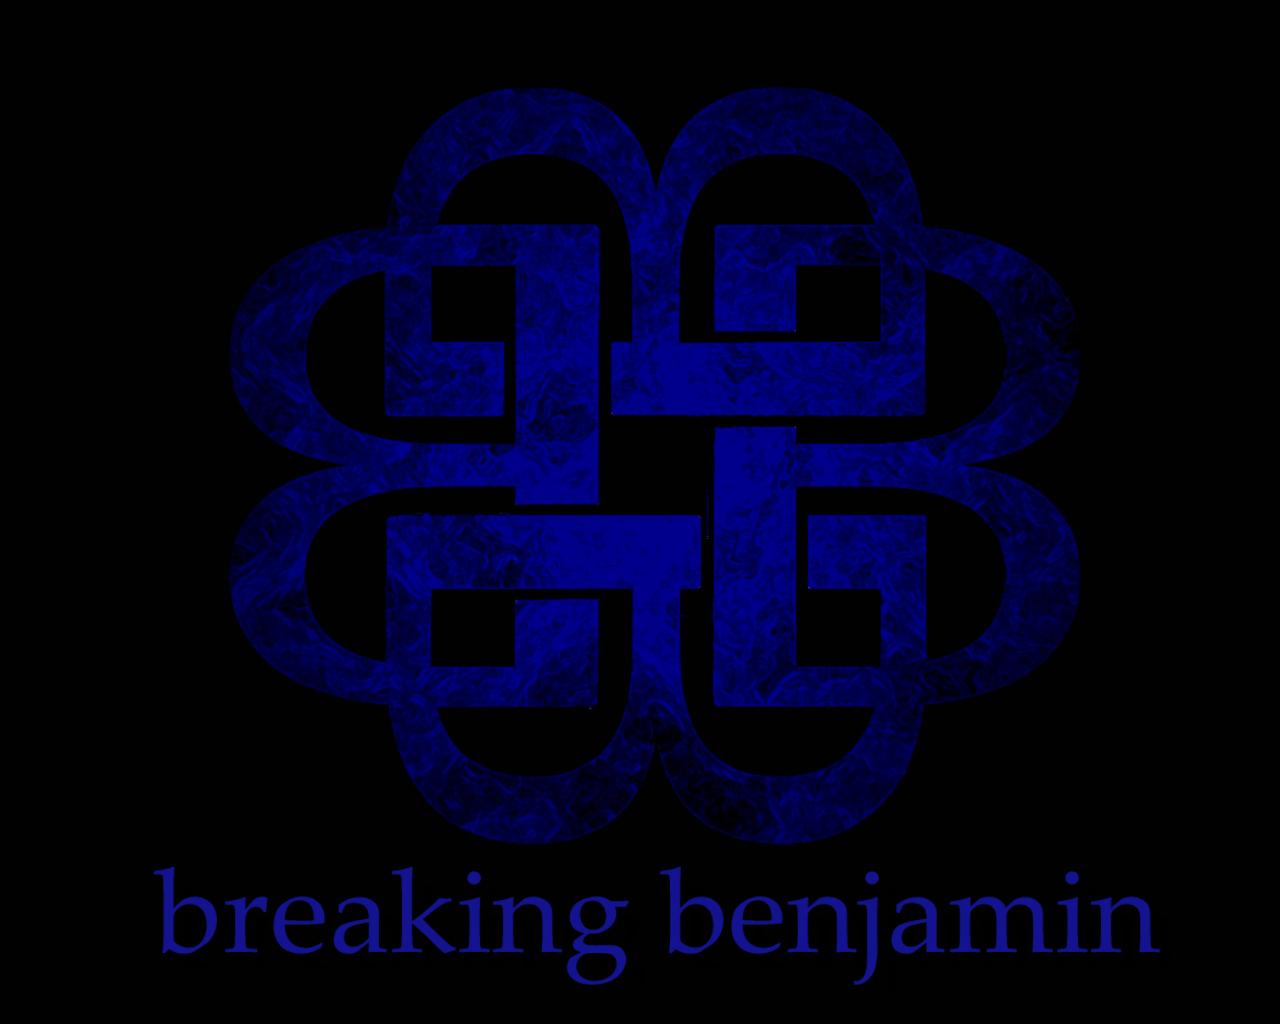 breaking benjamin logo   Breaking Benjamin Wallpaper 8013845 1280x1024